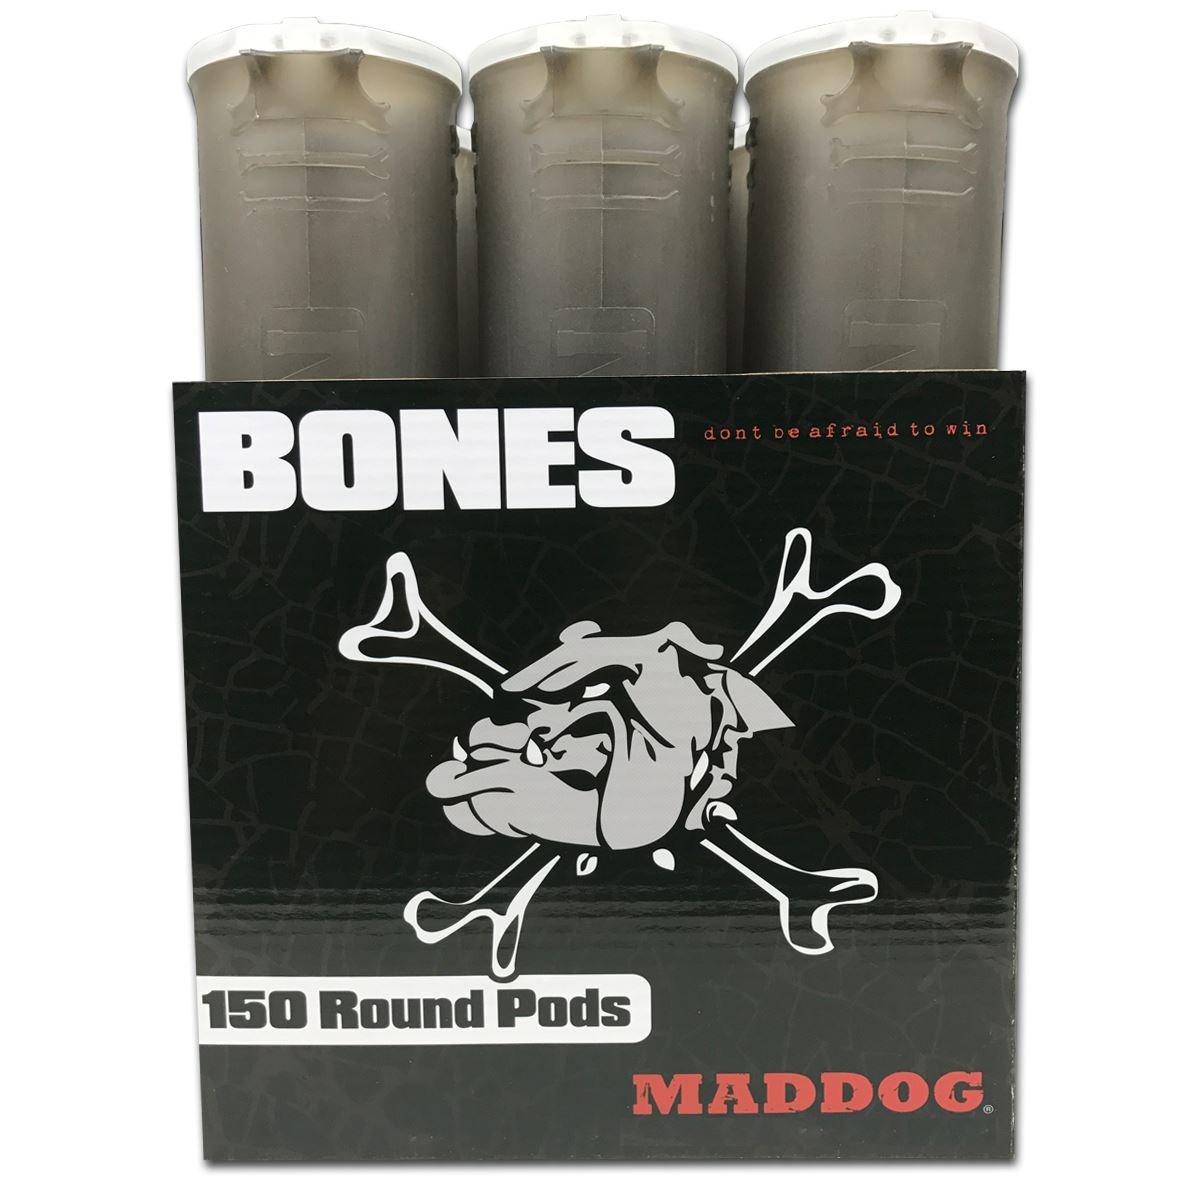 MAddog 150 Round BONES Paintball Pod - Smoke - 48 Pack by MAddog